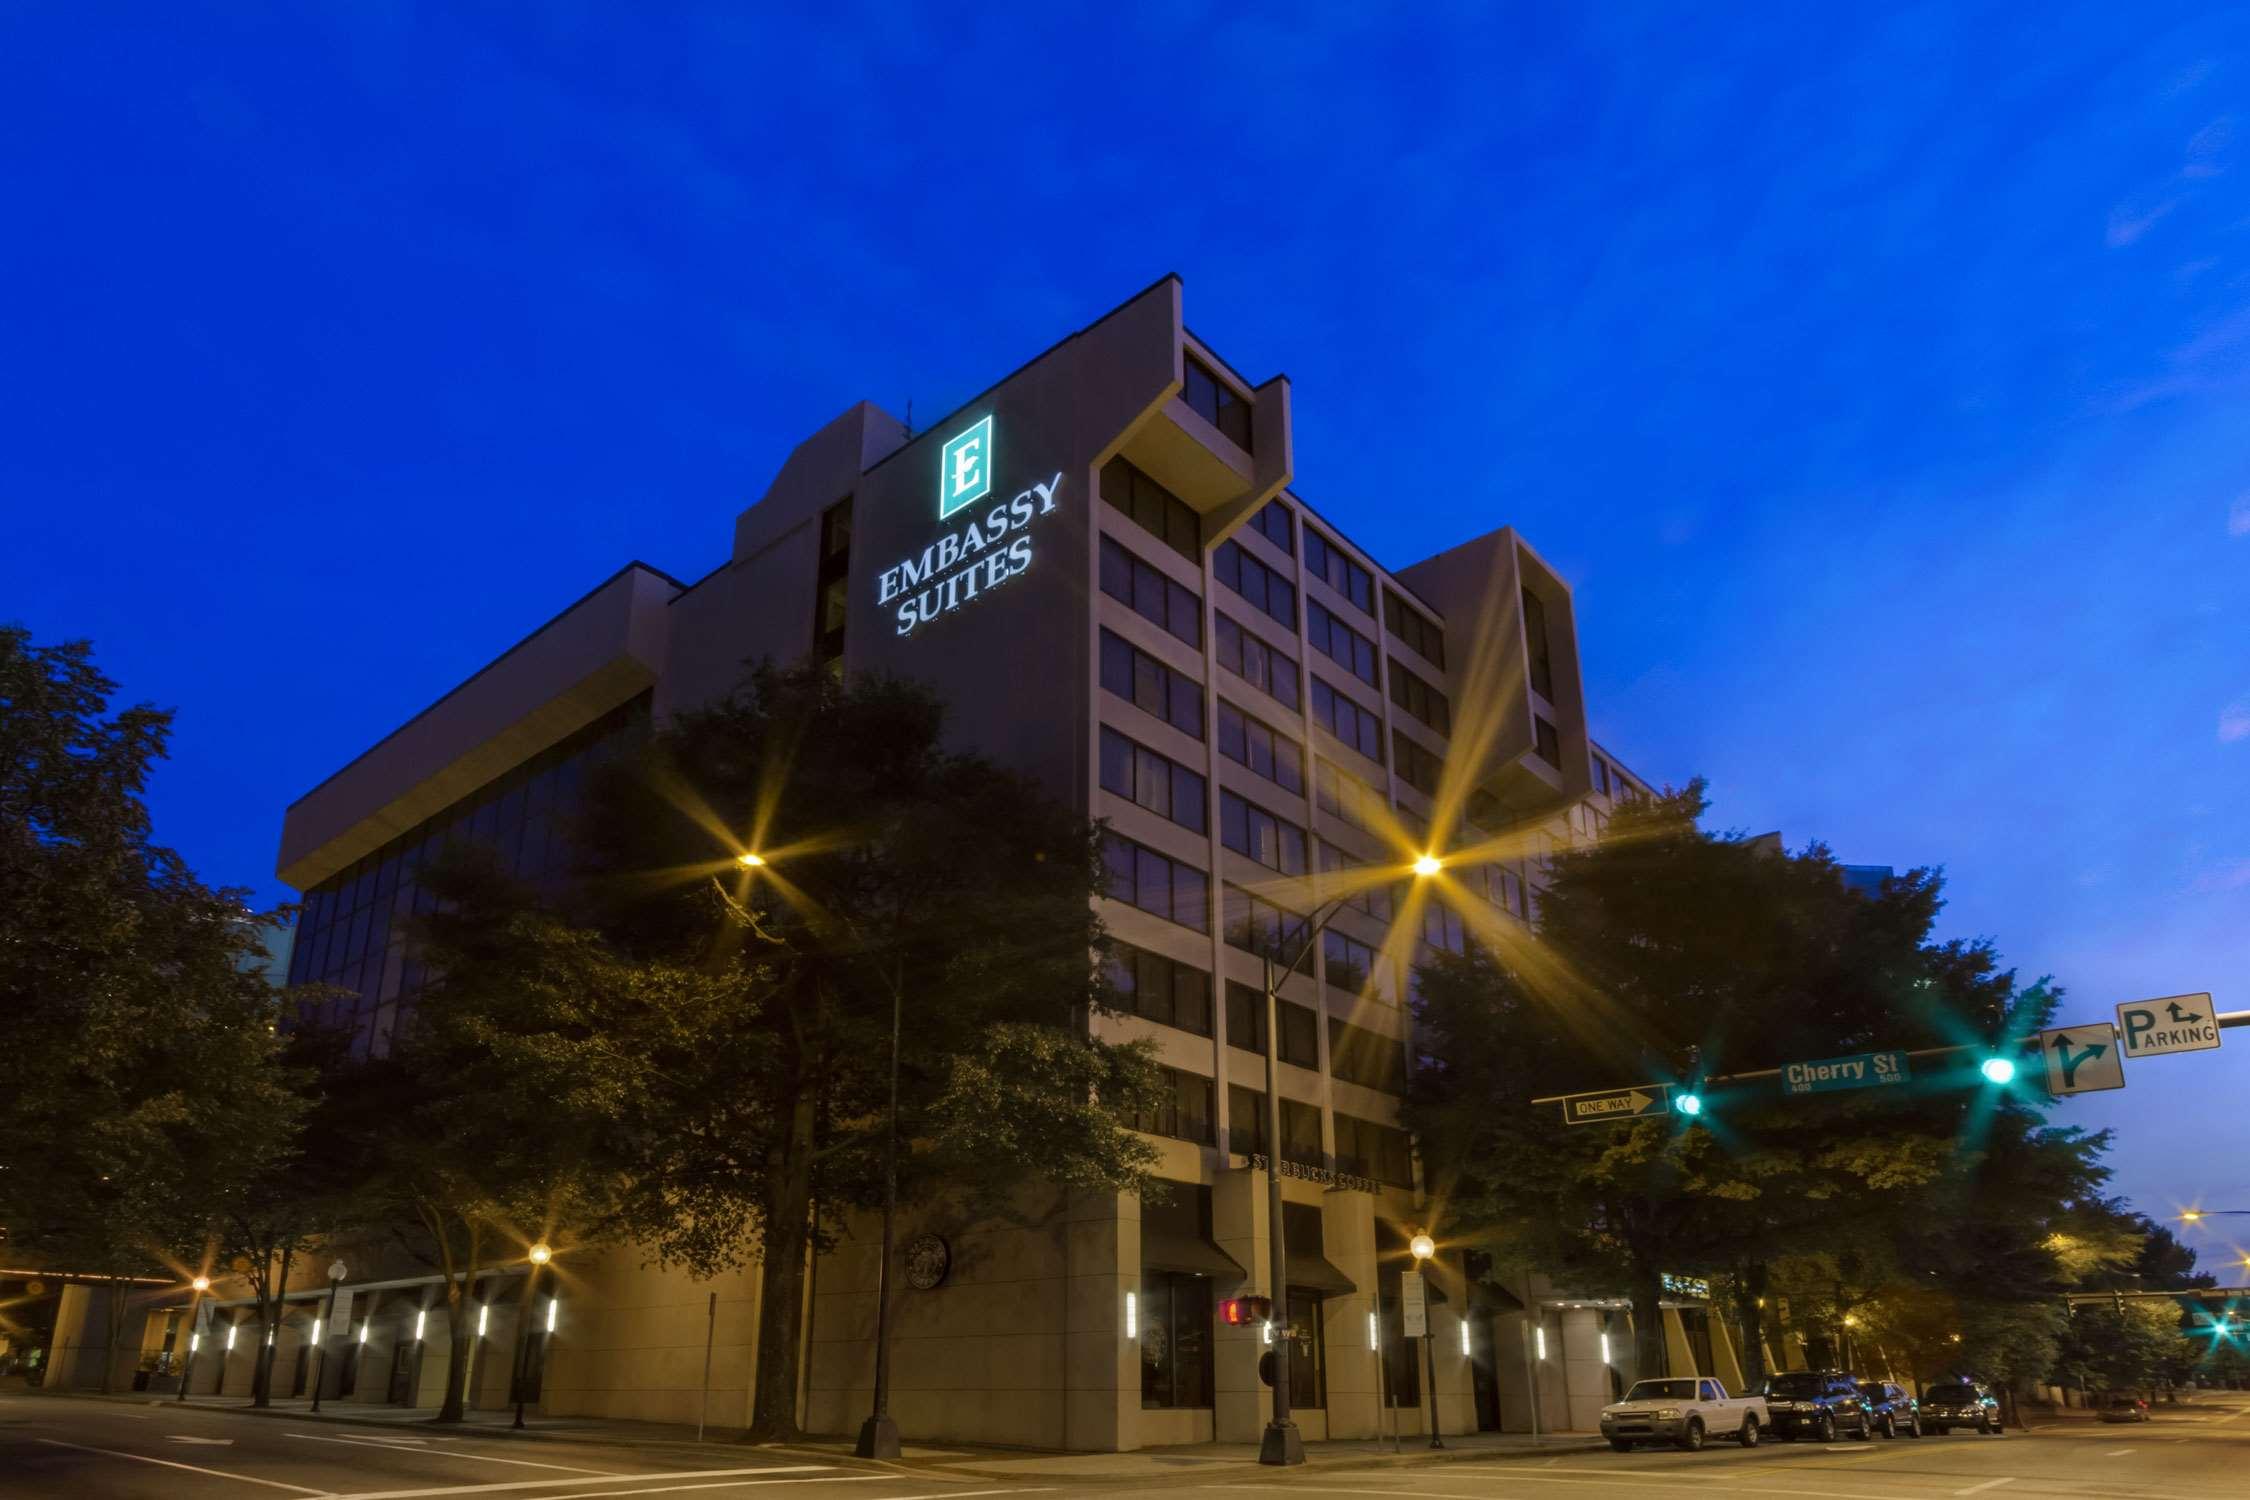 Embassy Suites by Hilton Winston Salem image 1